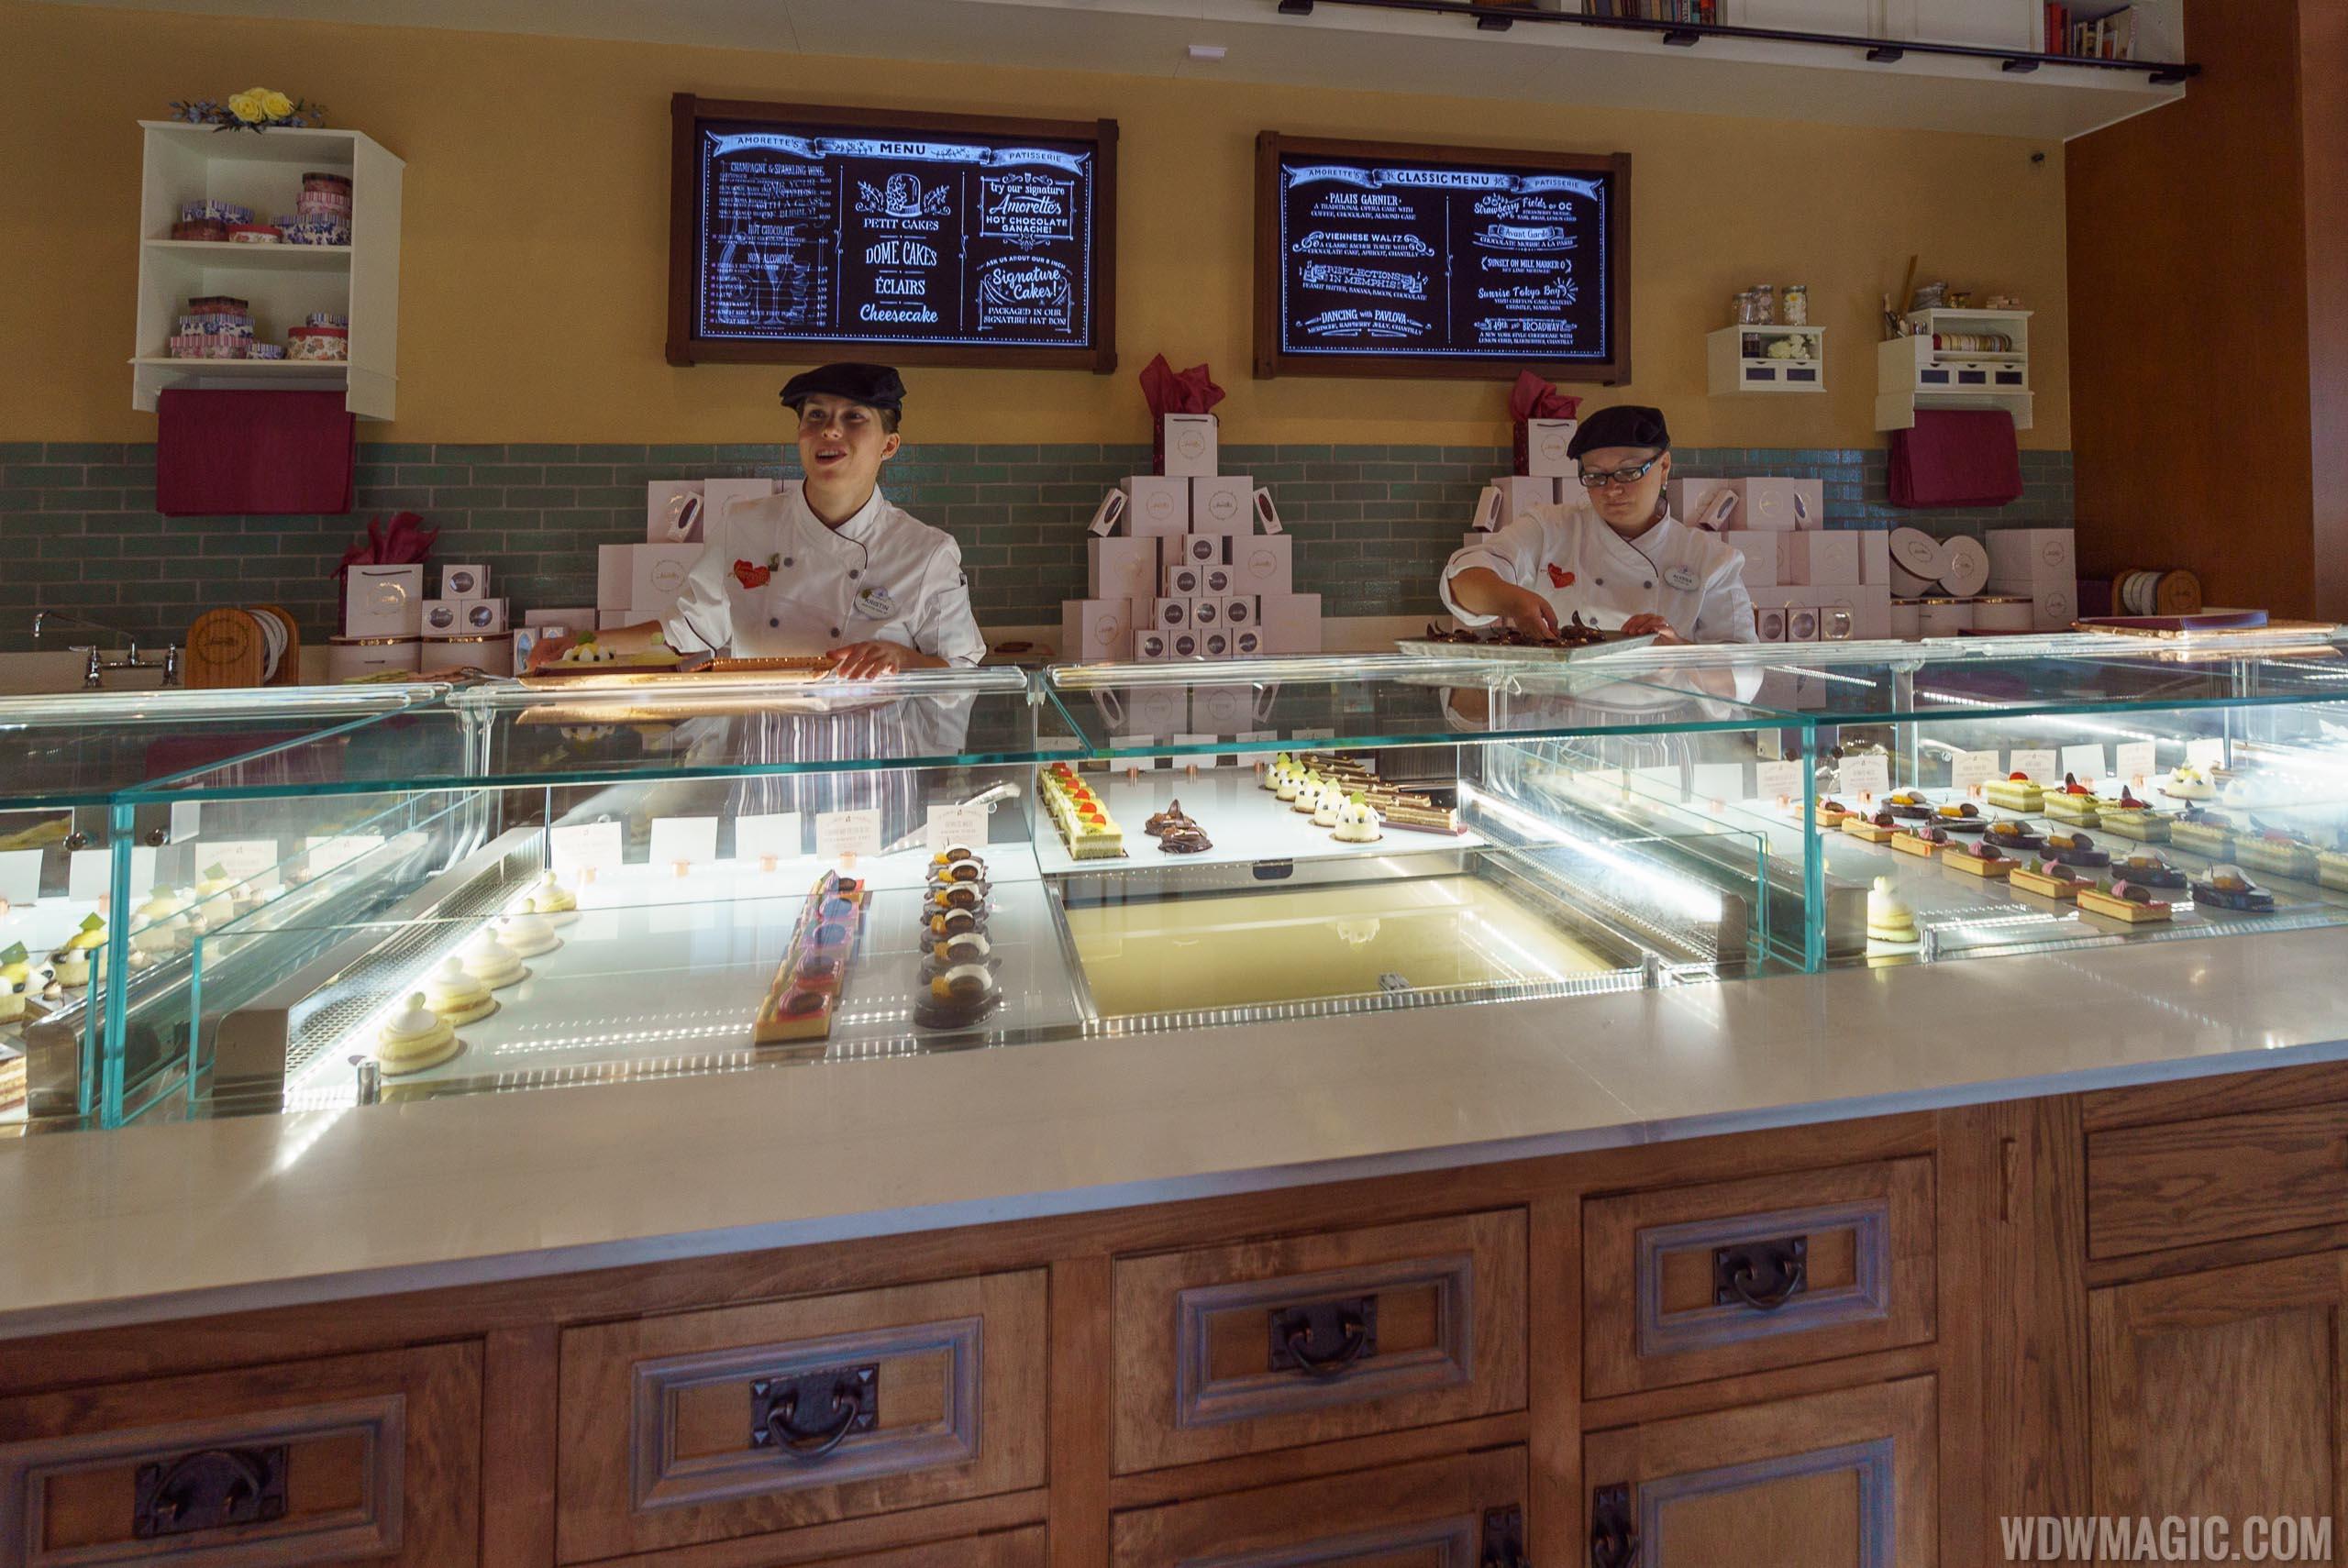 Amorette's Patisserie - Ordering